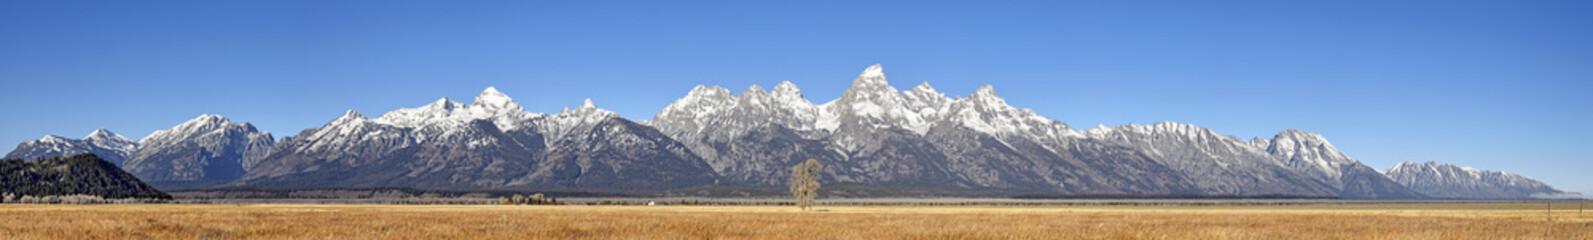 High quality mega panoramic picture of the Grand Teton Mountain Range in autumn, Wyoming, USA.